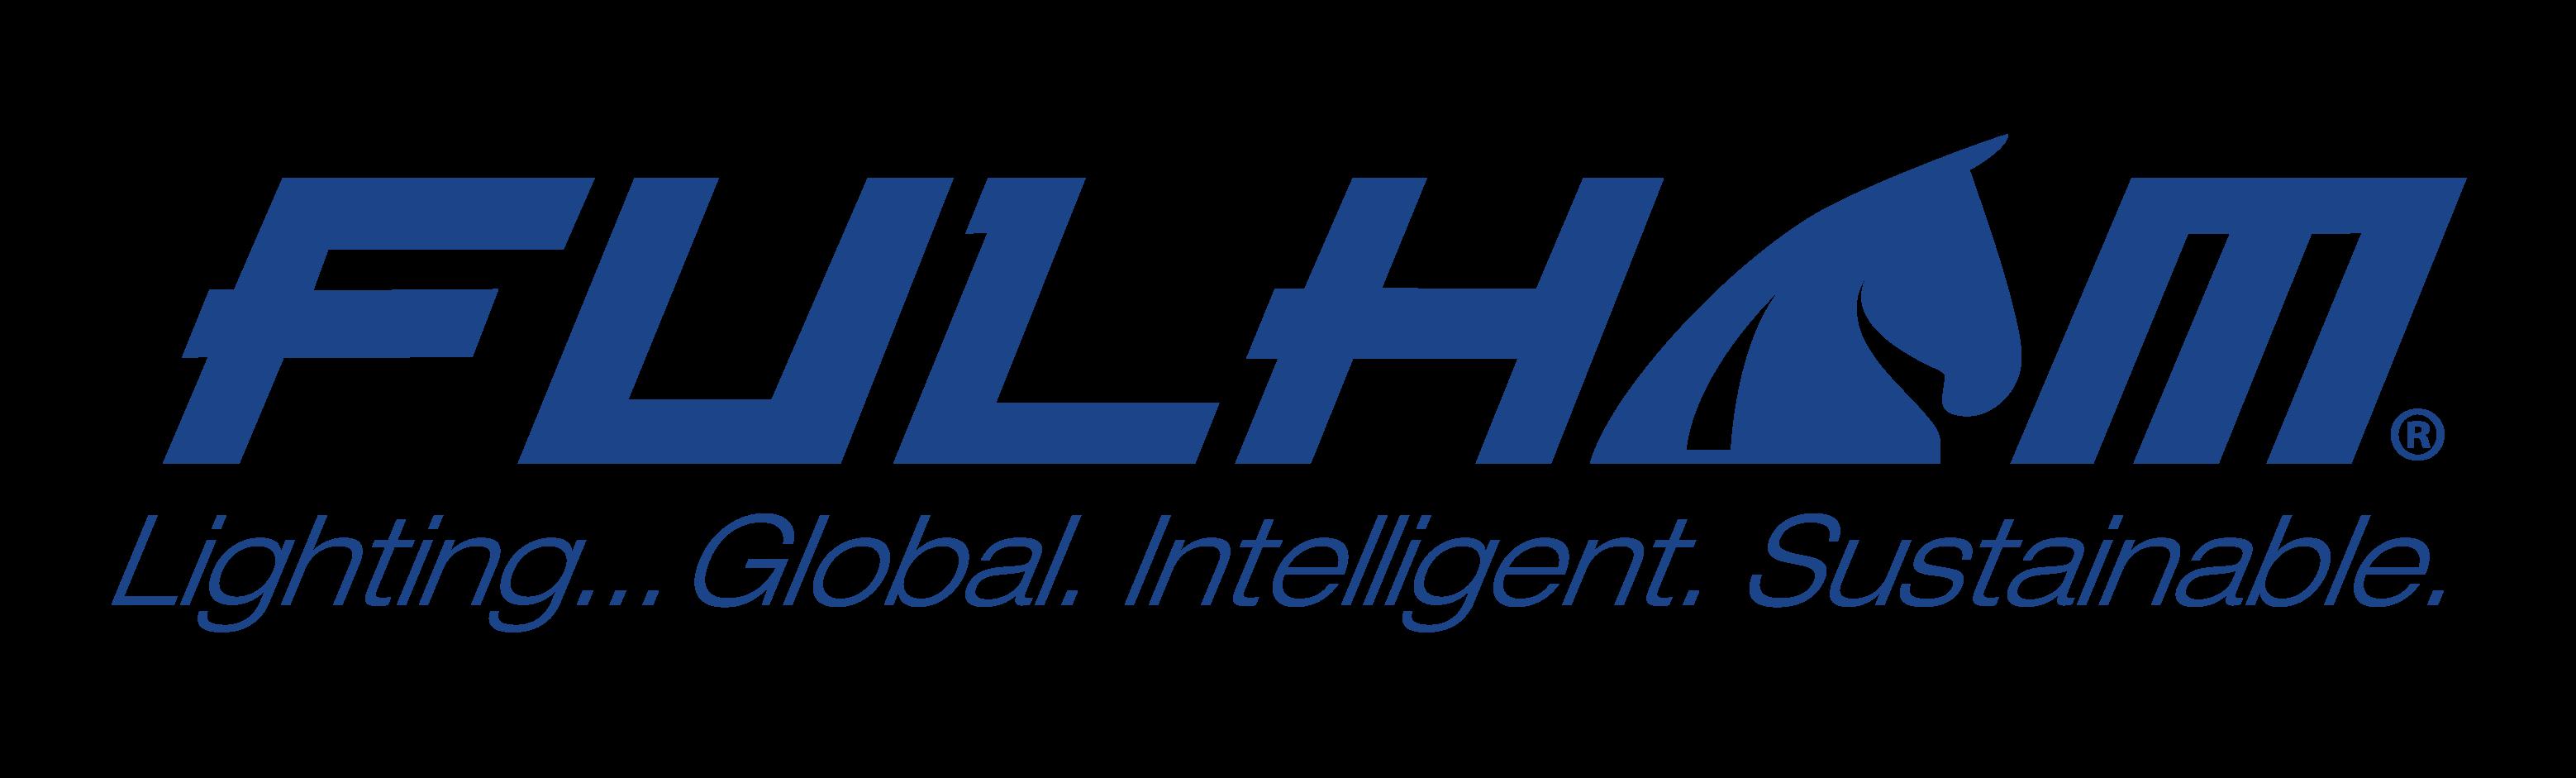 Image result for Fulham lighting logo